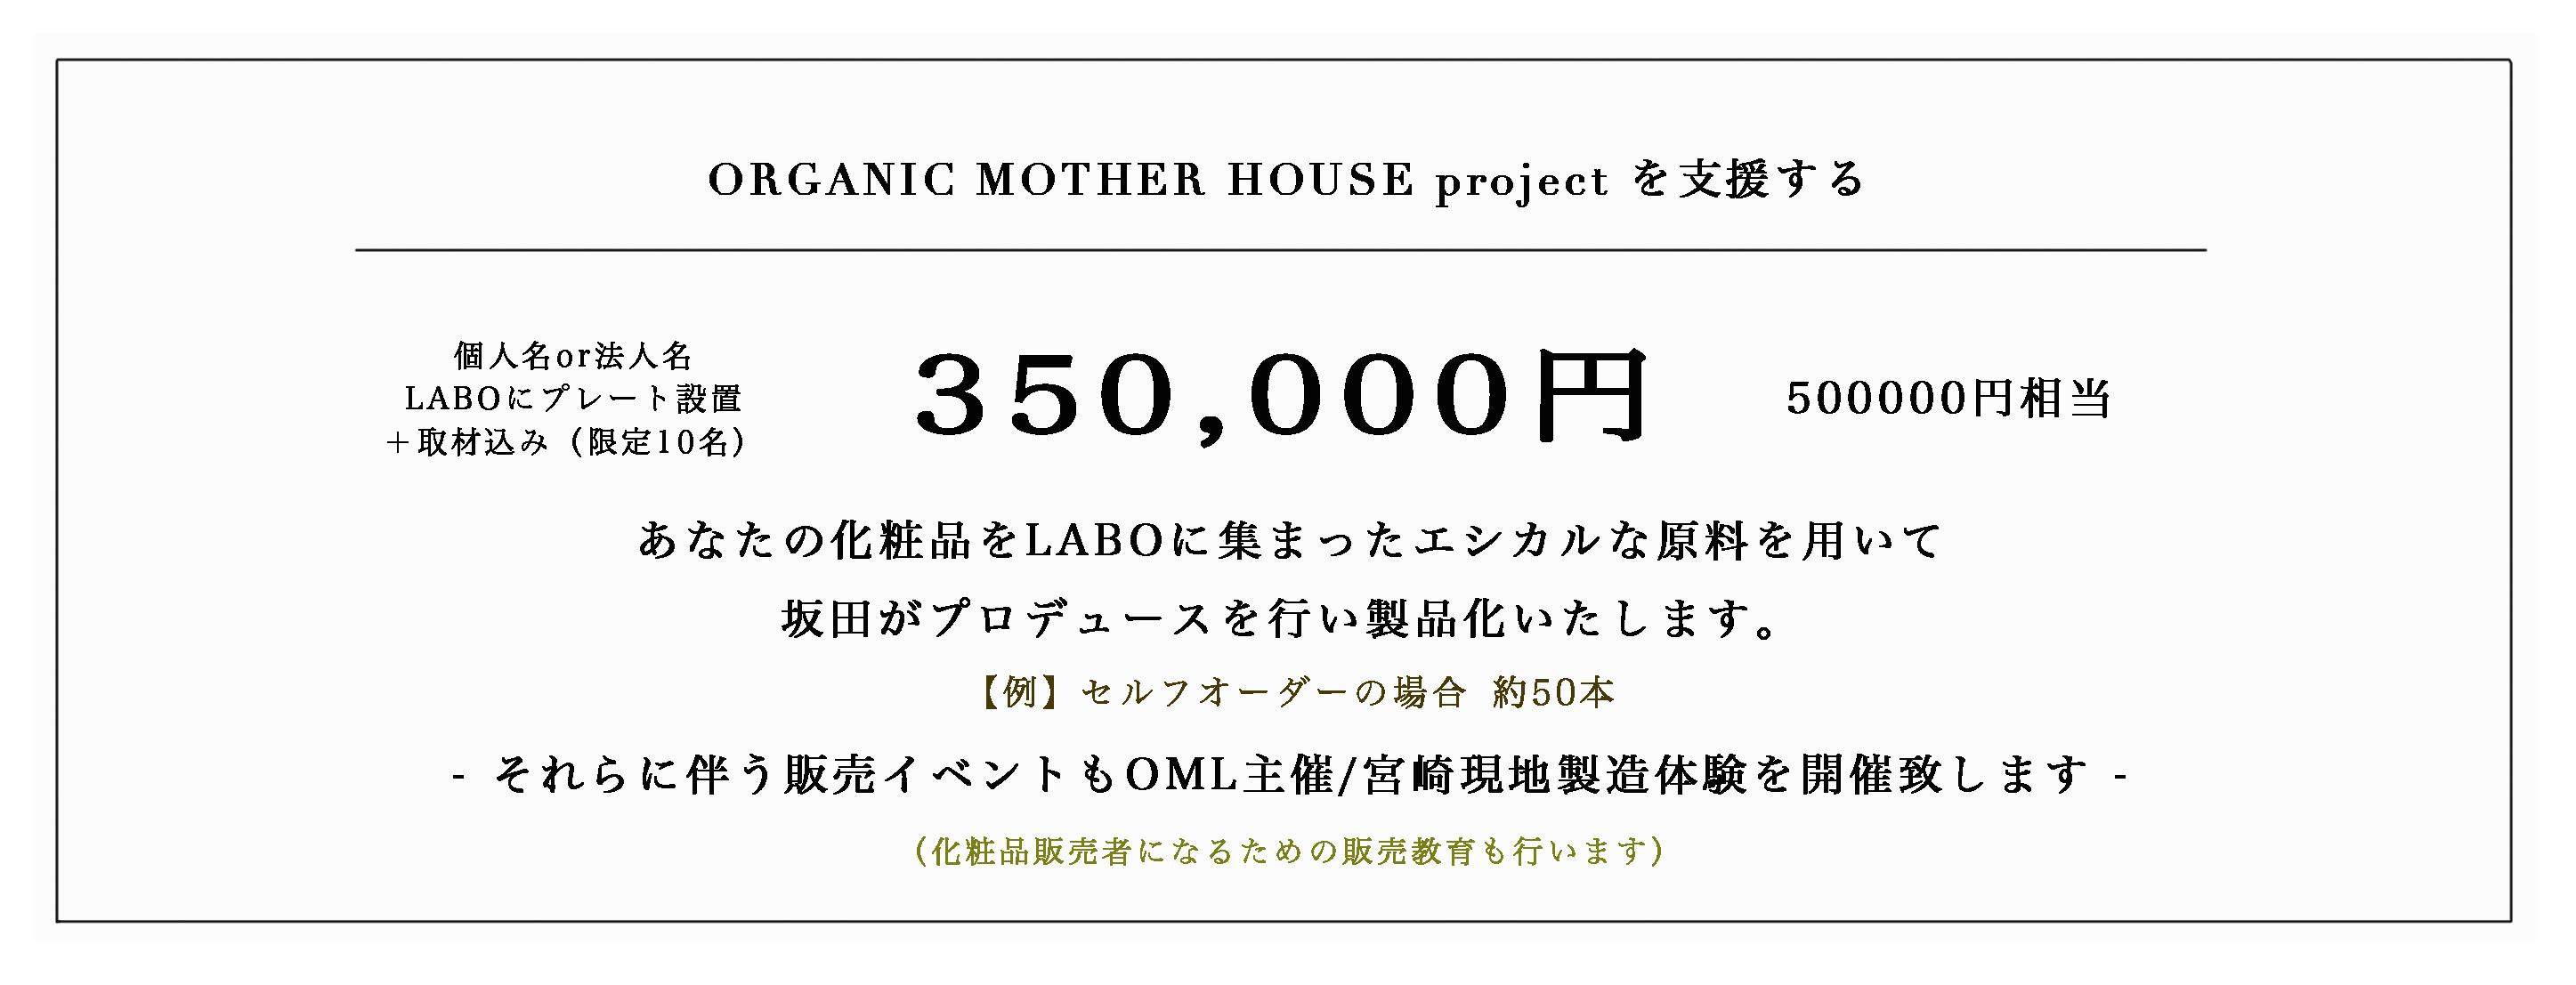 ORGANIC MOTHER HOUSE〈植物調合美容研究所〉35万